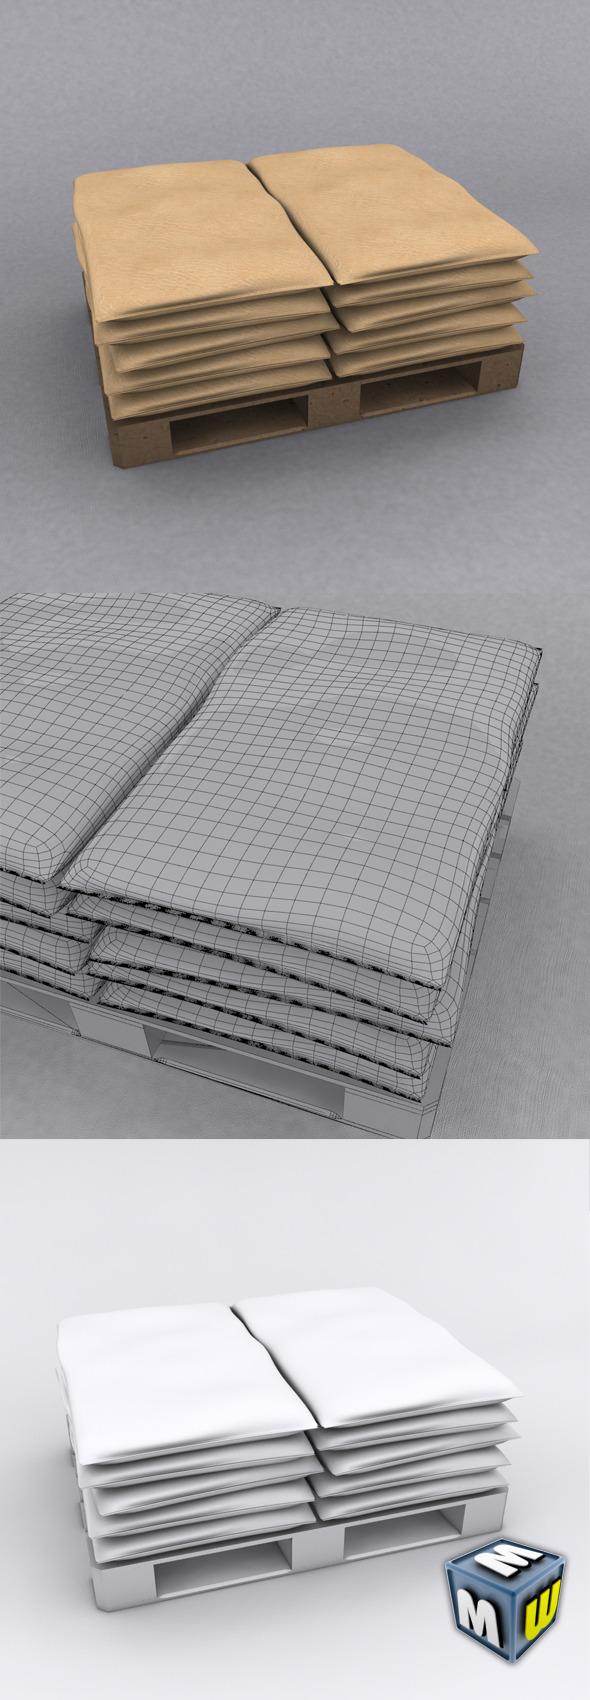 Sacks3D - 3DOcean Item for Sale